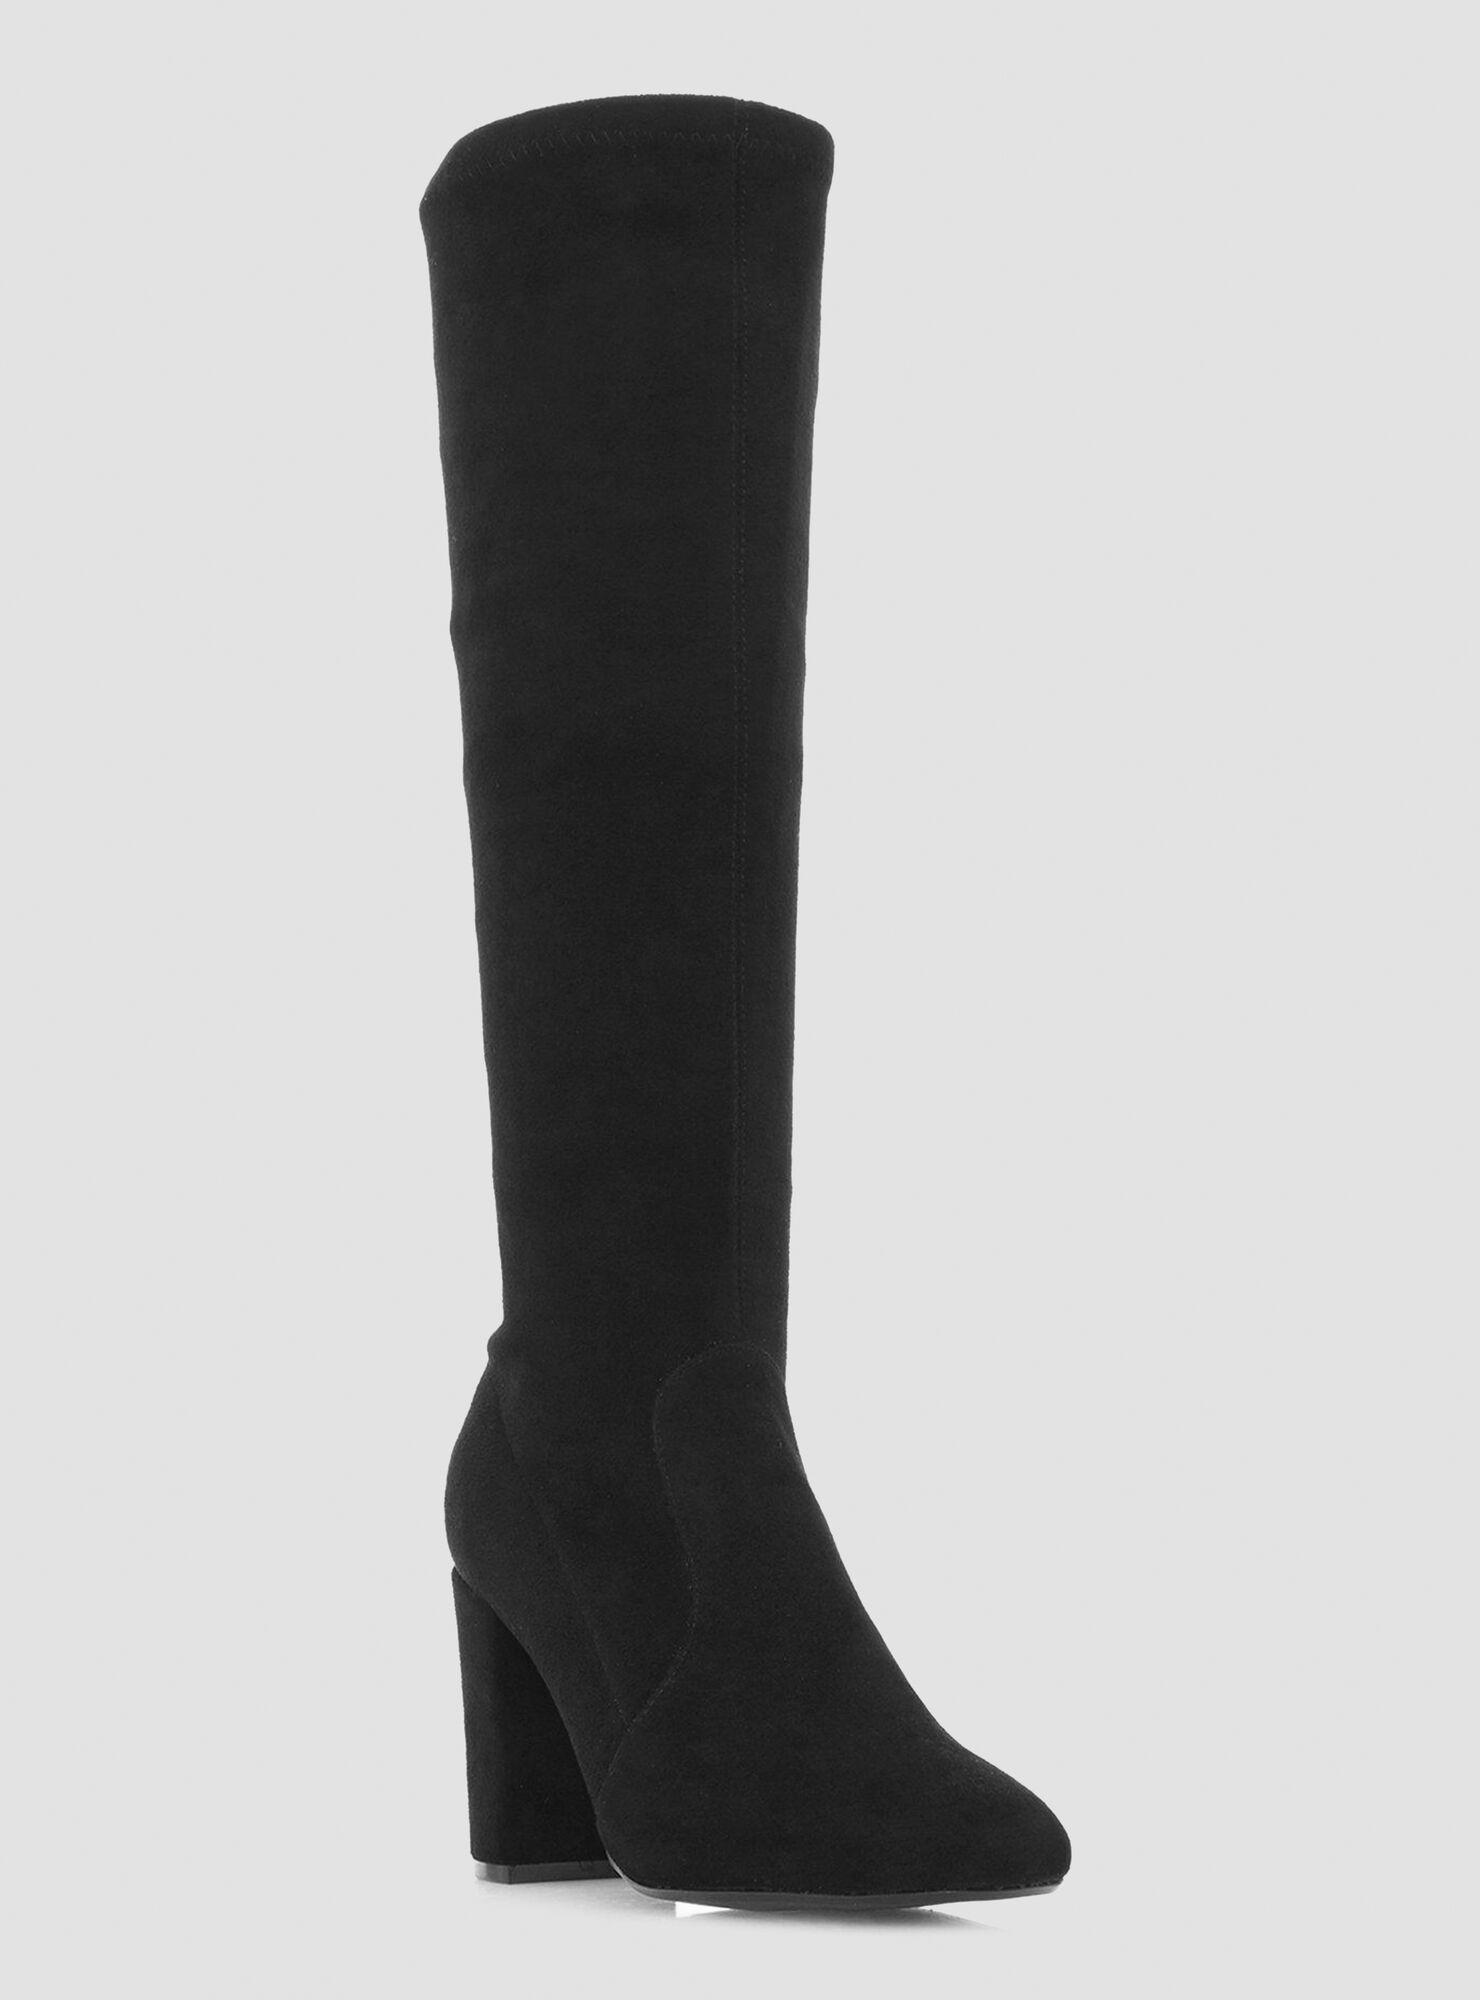 3c905f0d9b3 Zapatos Marcas Zapatos Mujer Dune Bota Dune Sereinity. Bota%20Dune%20Sereinity%2CNegro%2Chi-res  ...